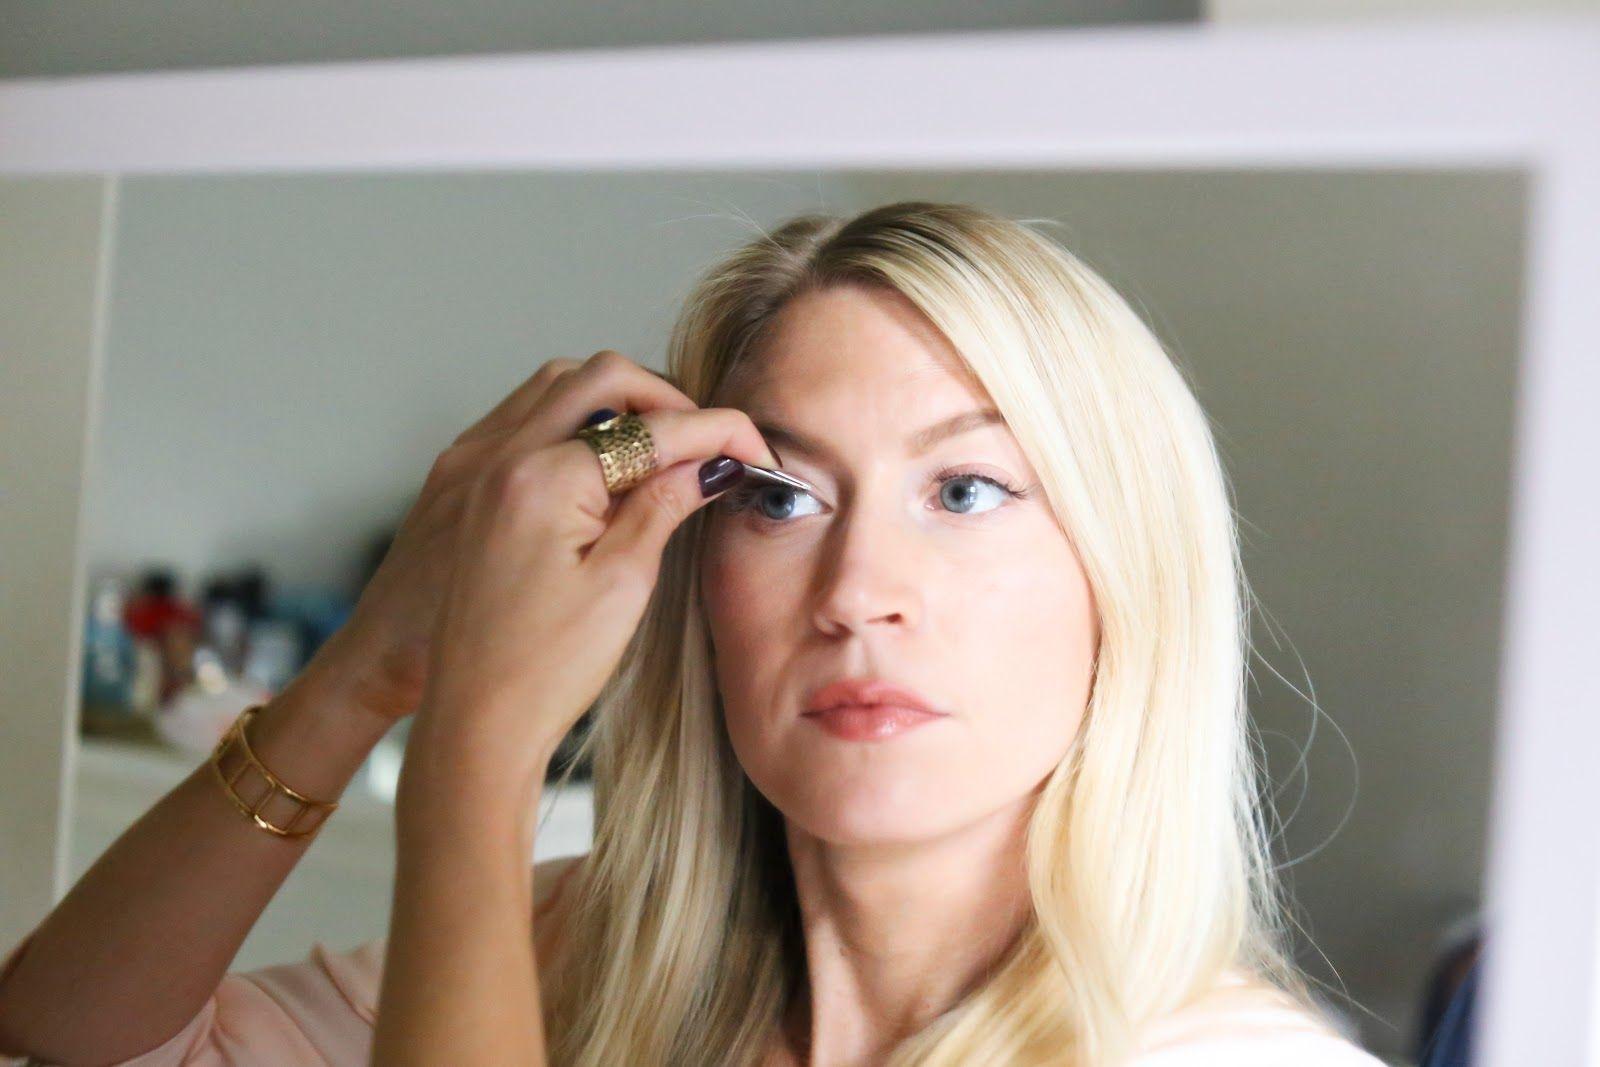 HOW TO APPLY EYELASH EXTENSIONS YOURSELF Eyelash